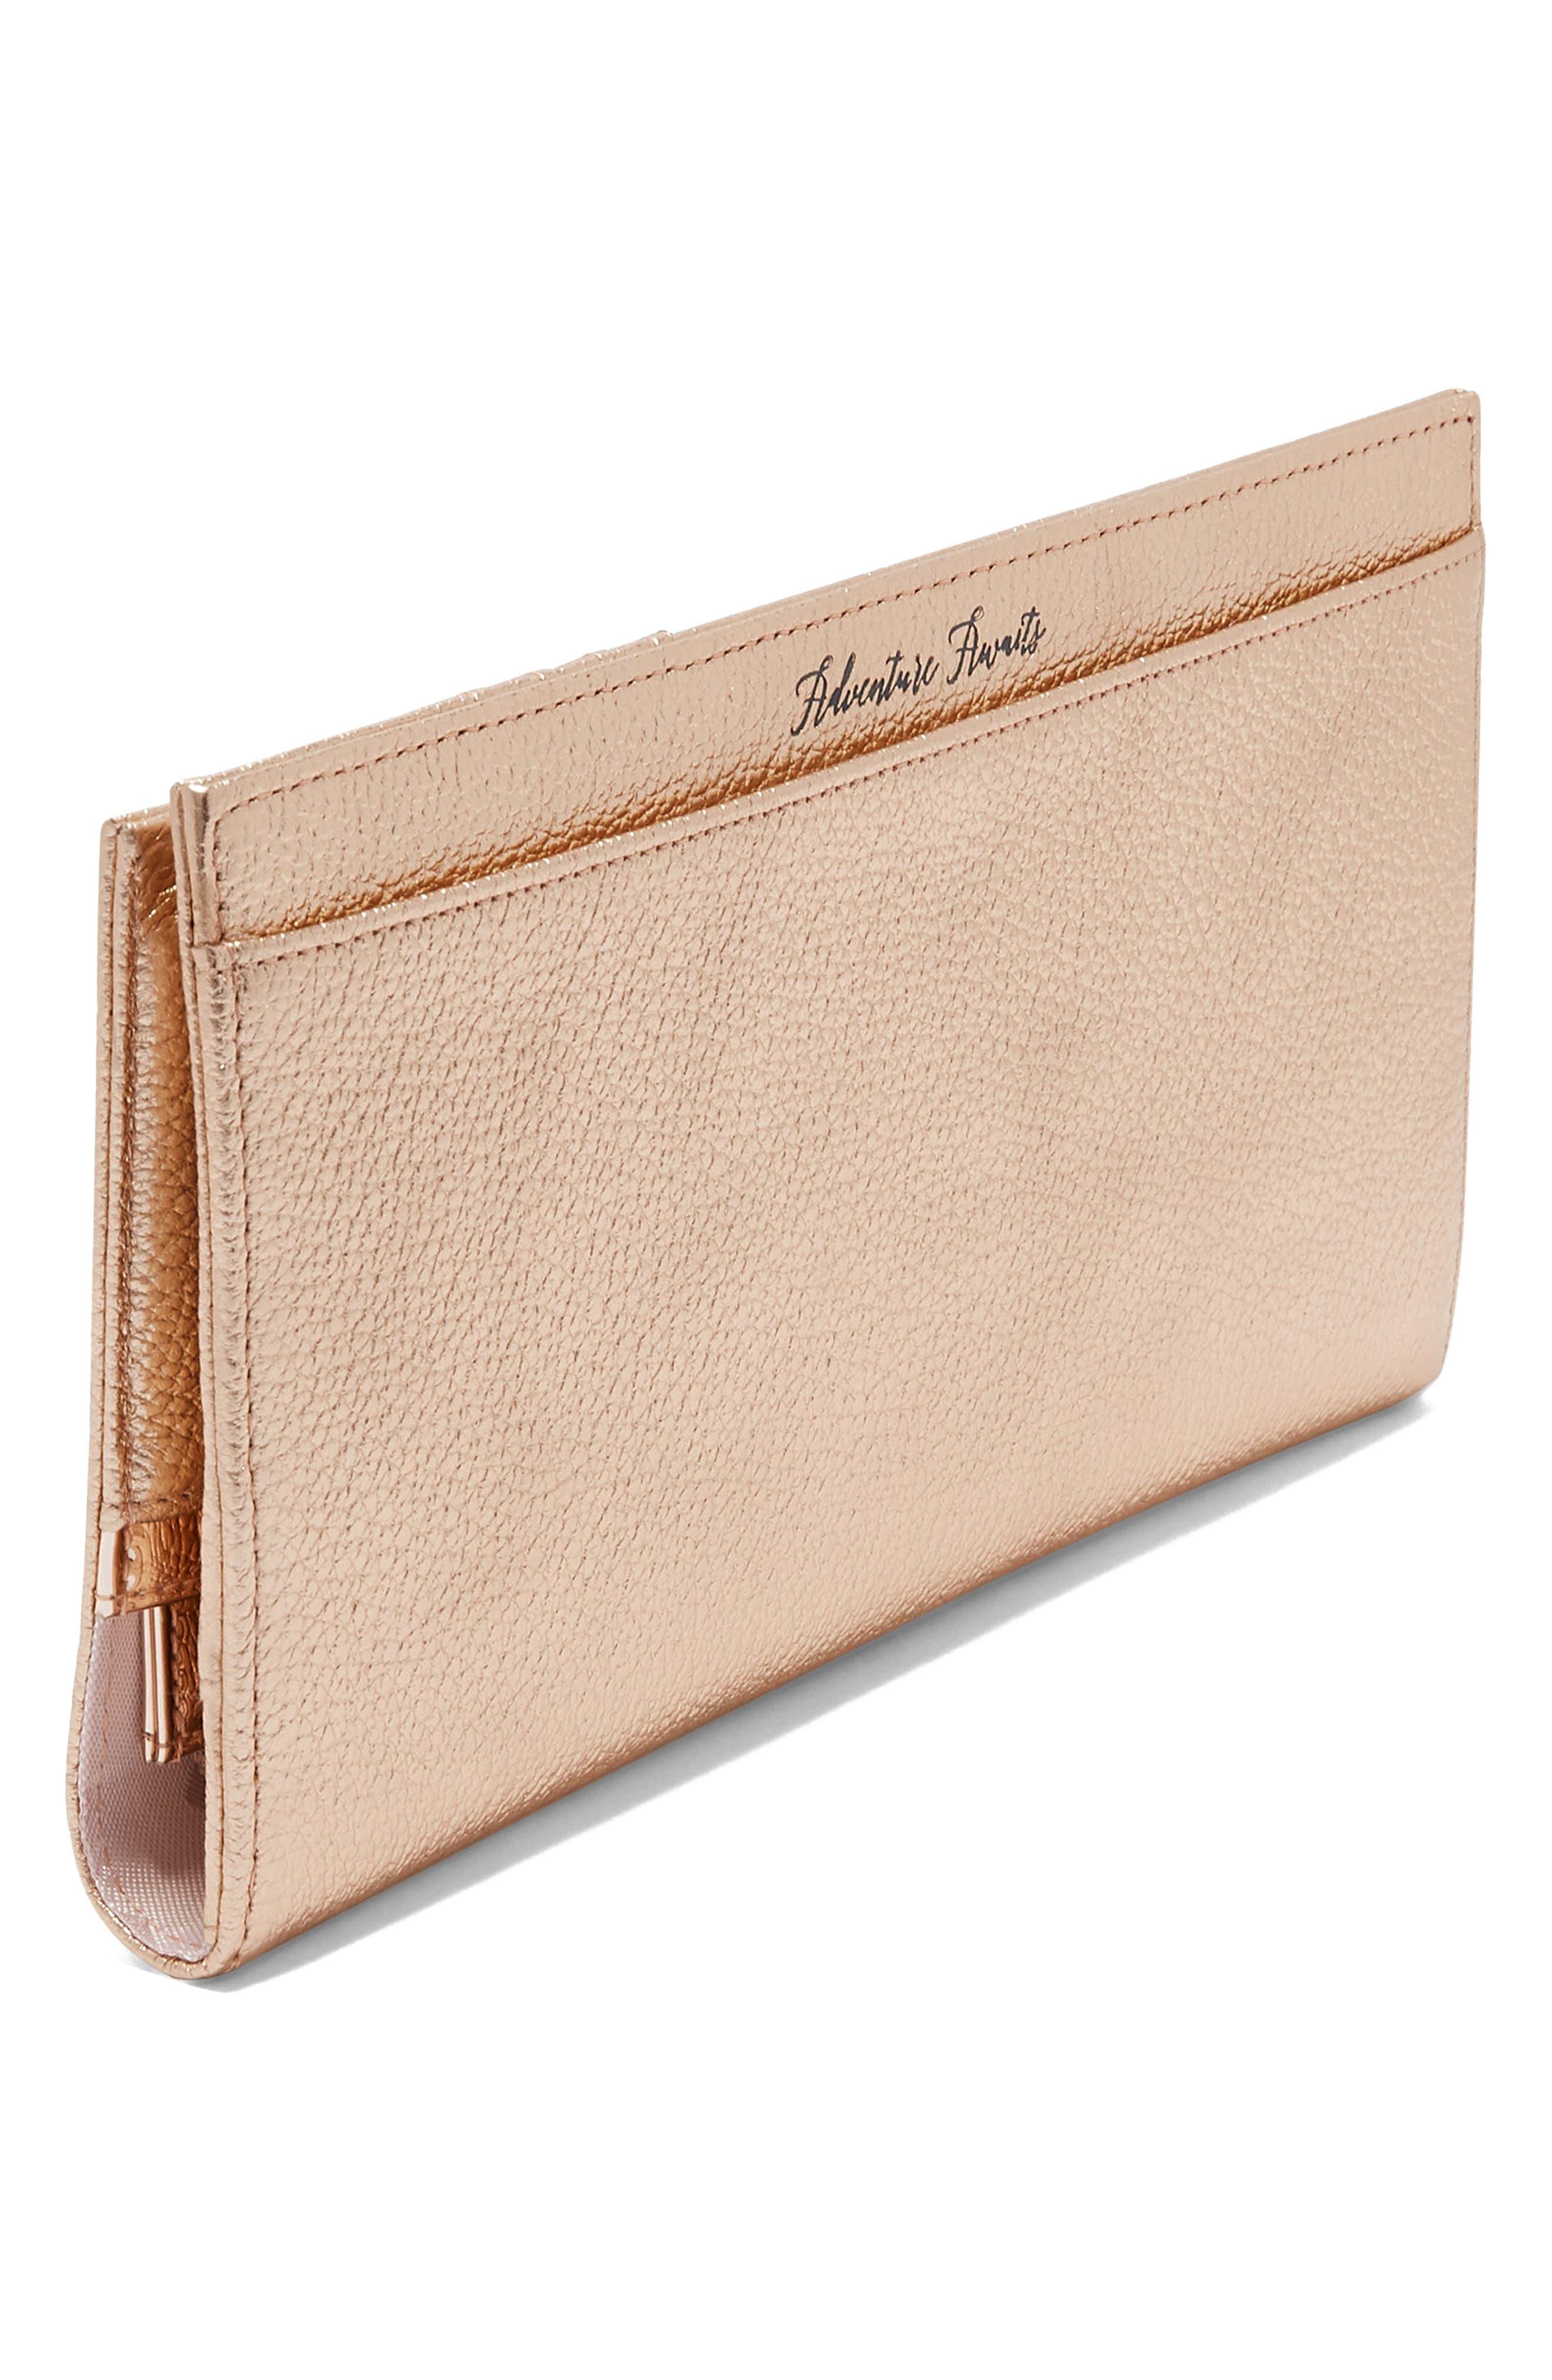 Kayy Metallic Leather Travel Wallet,                             Alternate thumbnail 5, color,